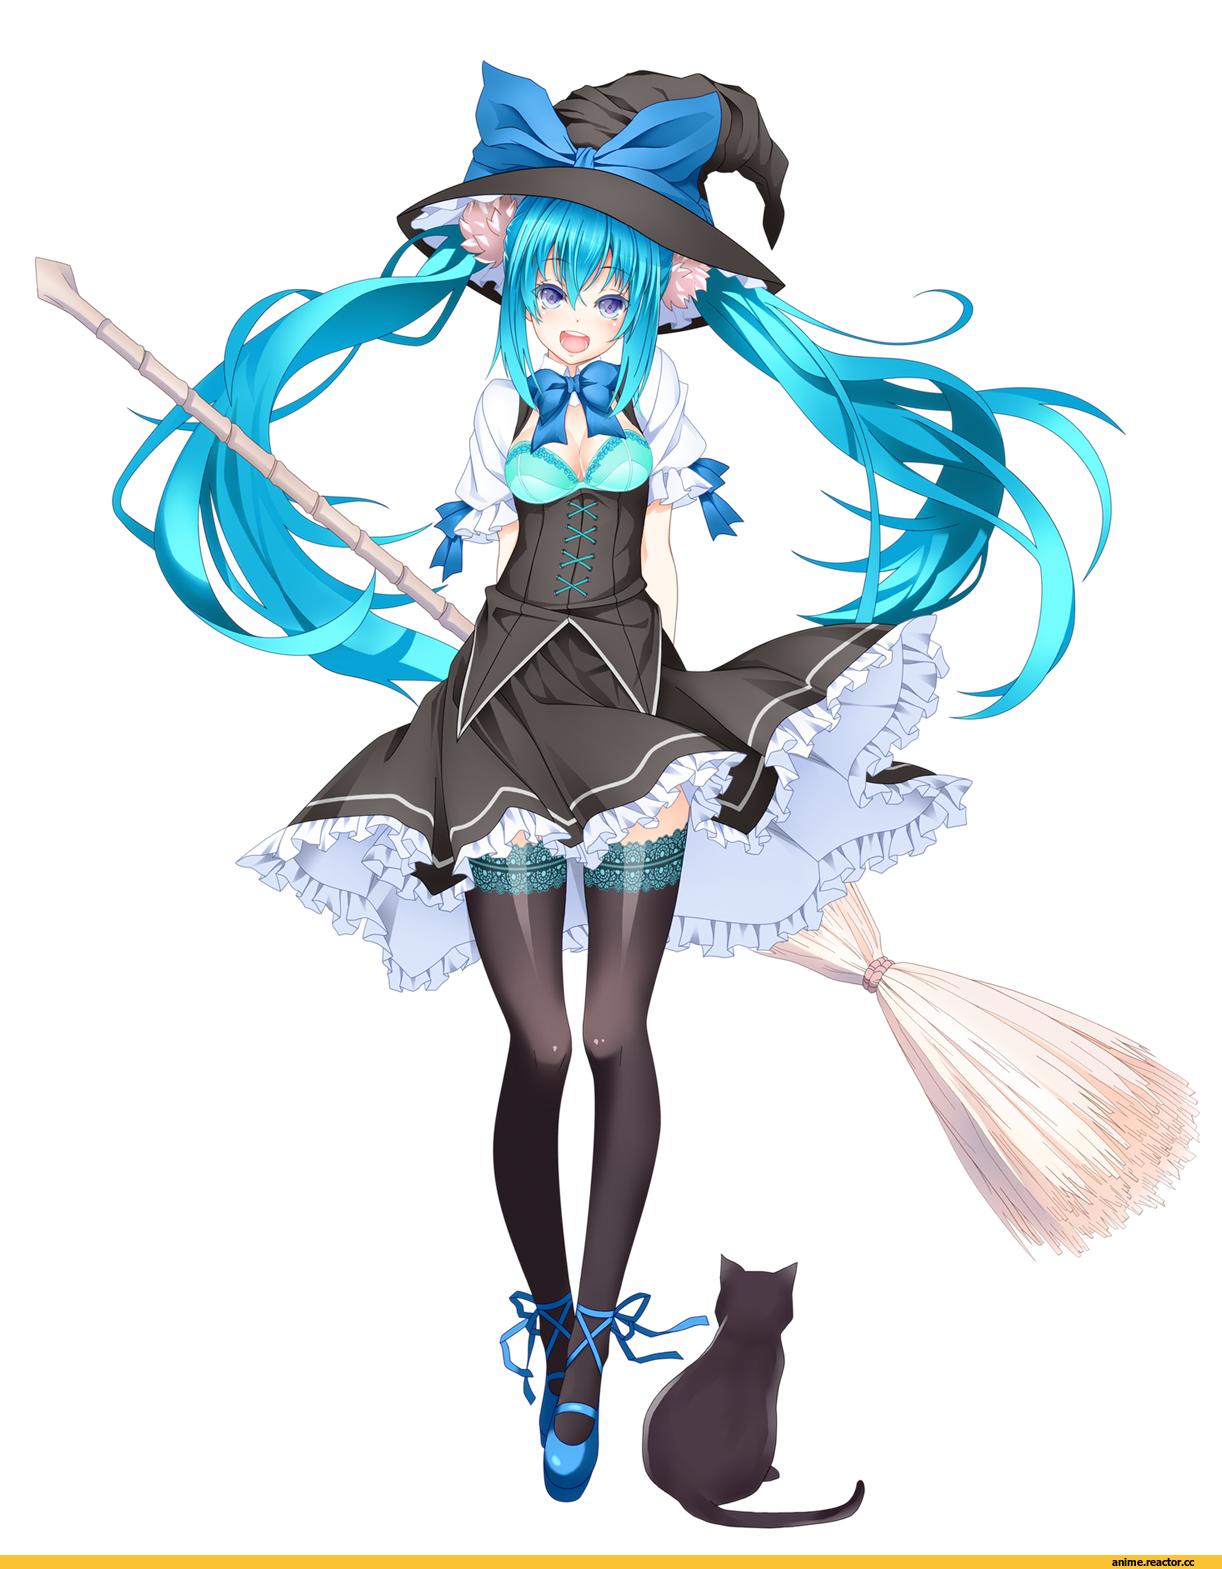 Hatsune Miku Vocaloid Anime Ffcreatyuuki 3209282 Png 1222 1555 Hatsune Miku Miku Hatsune